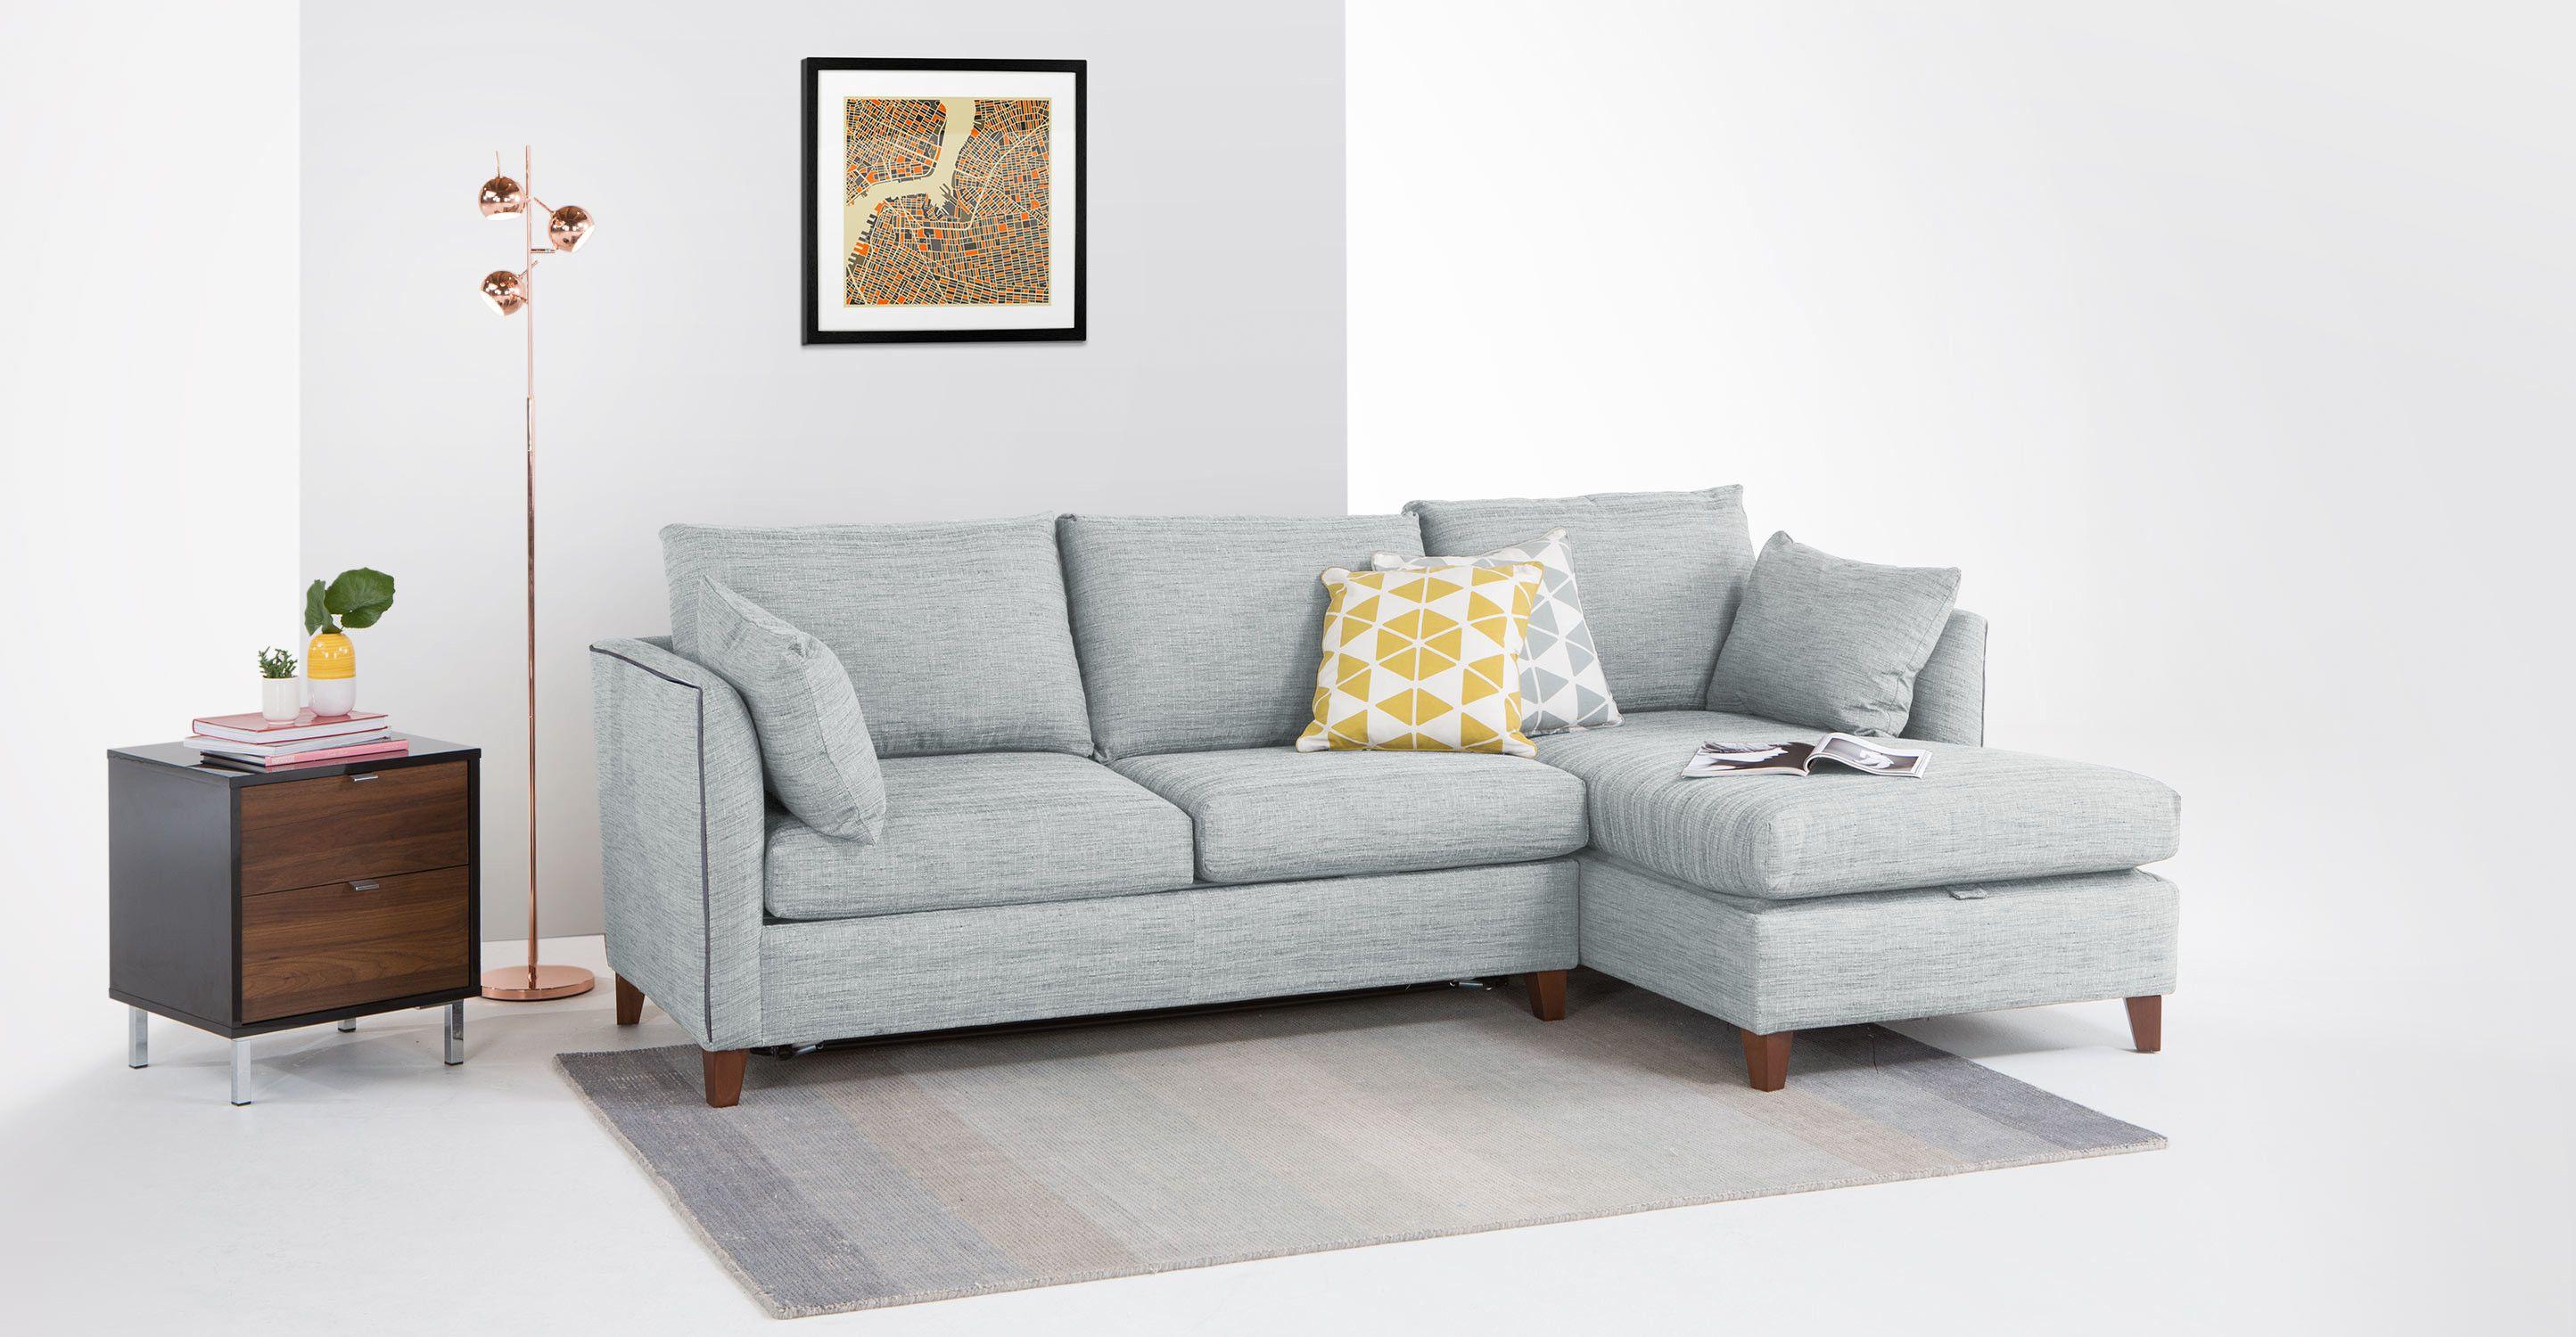 Pin by Simon Hofmeister on Interiors Corner sofa bed